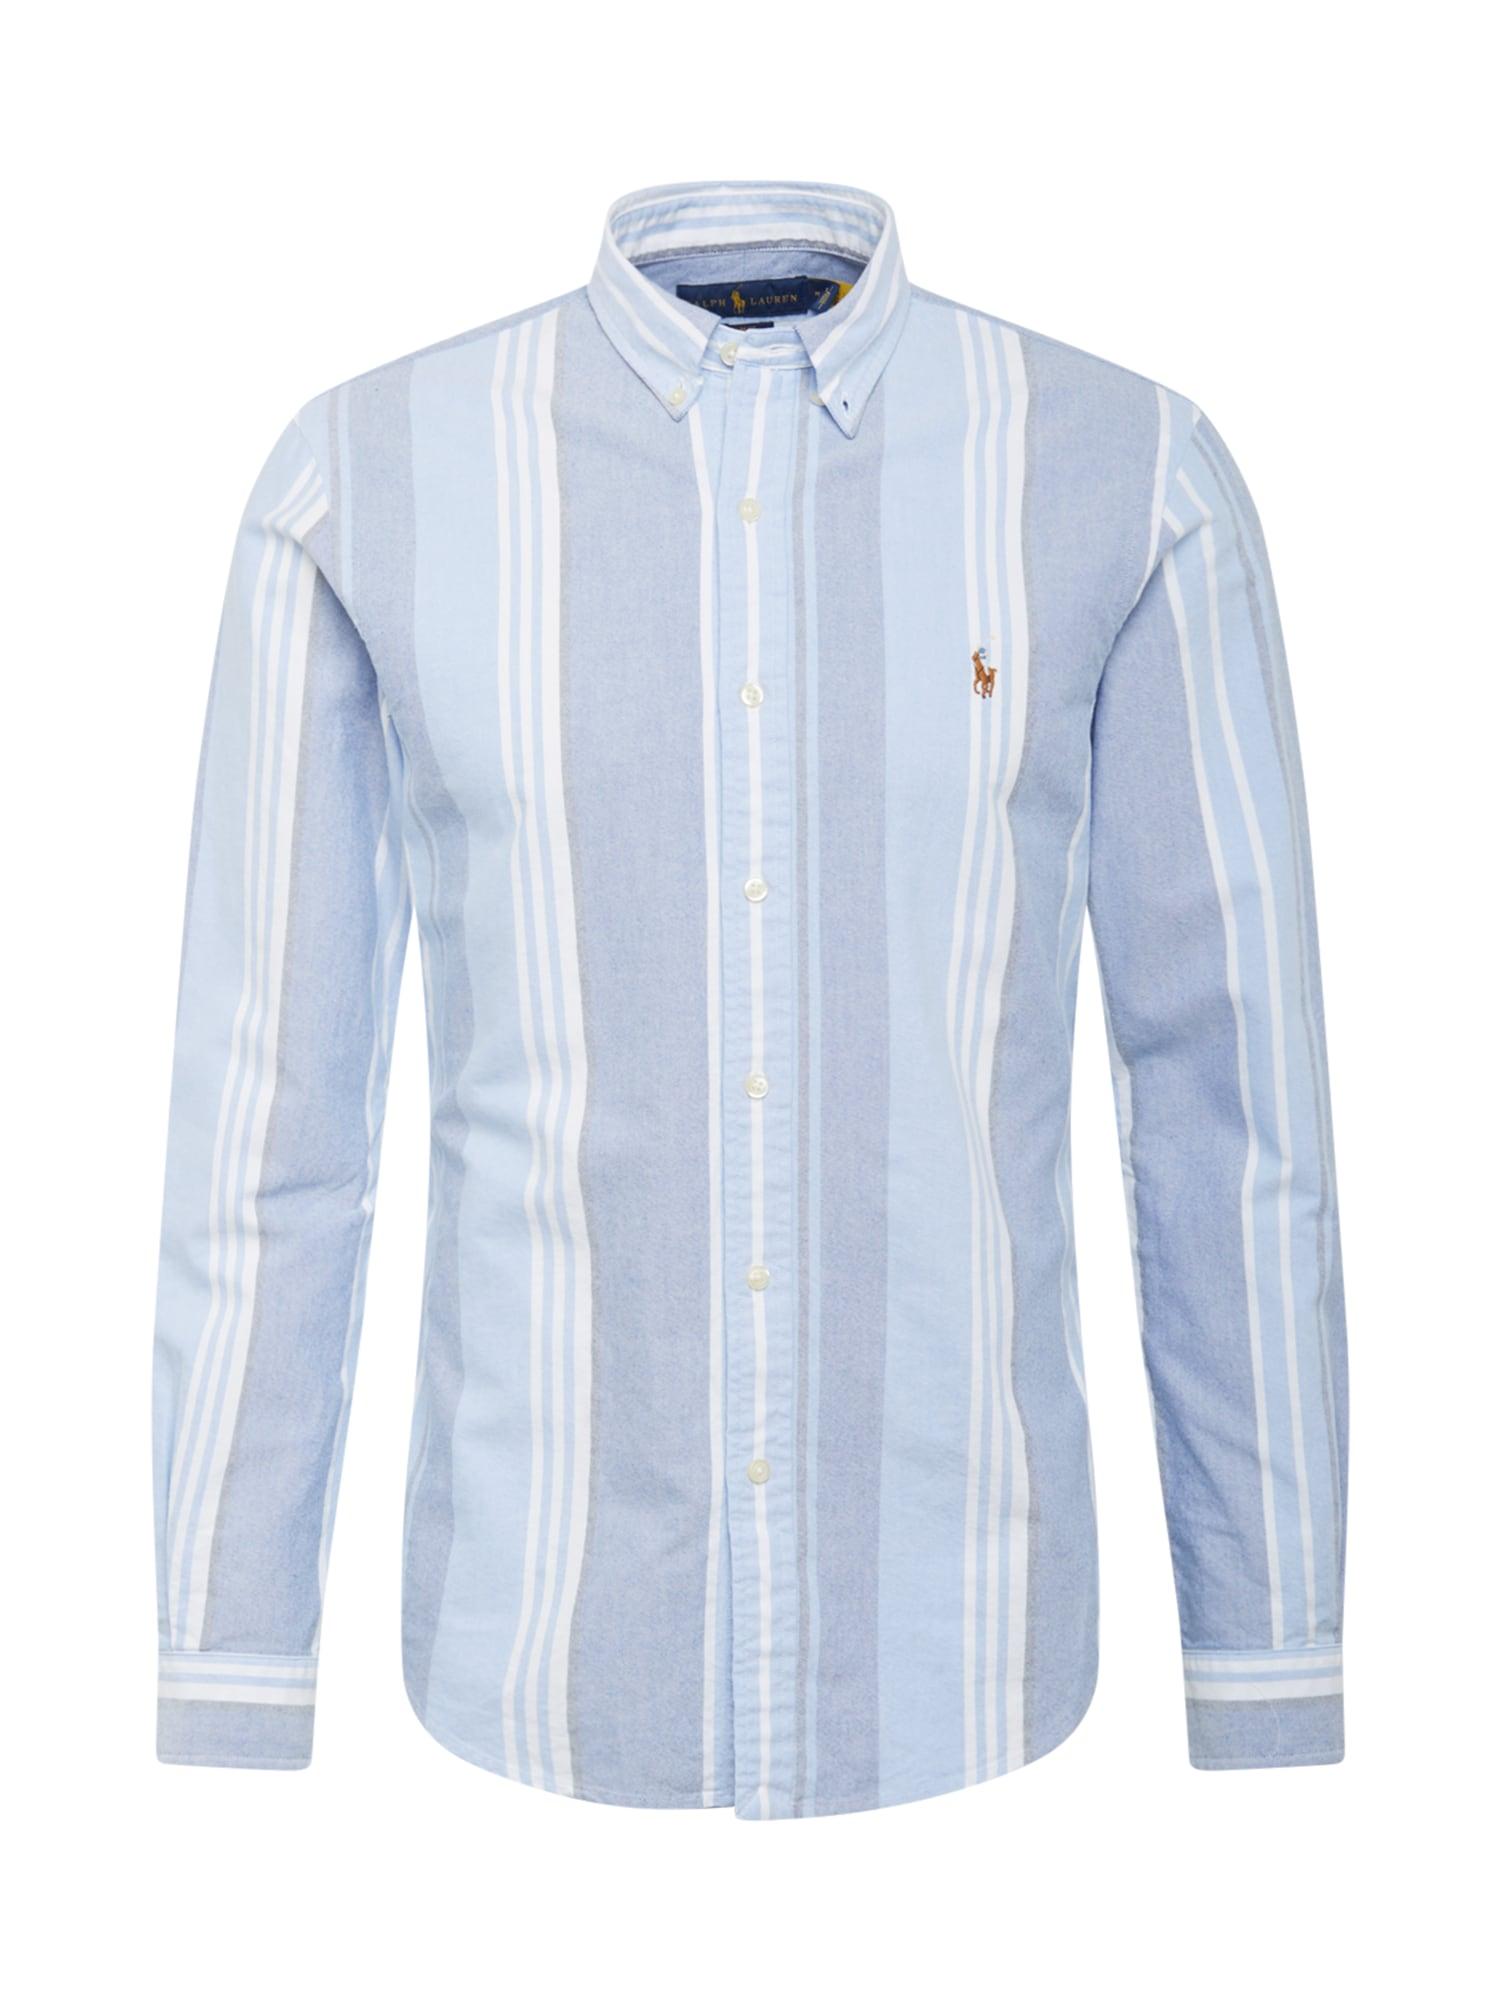 POLO RALPH LAUREN Košile  bílá / světlemodrá / kouřově modrá